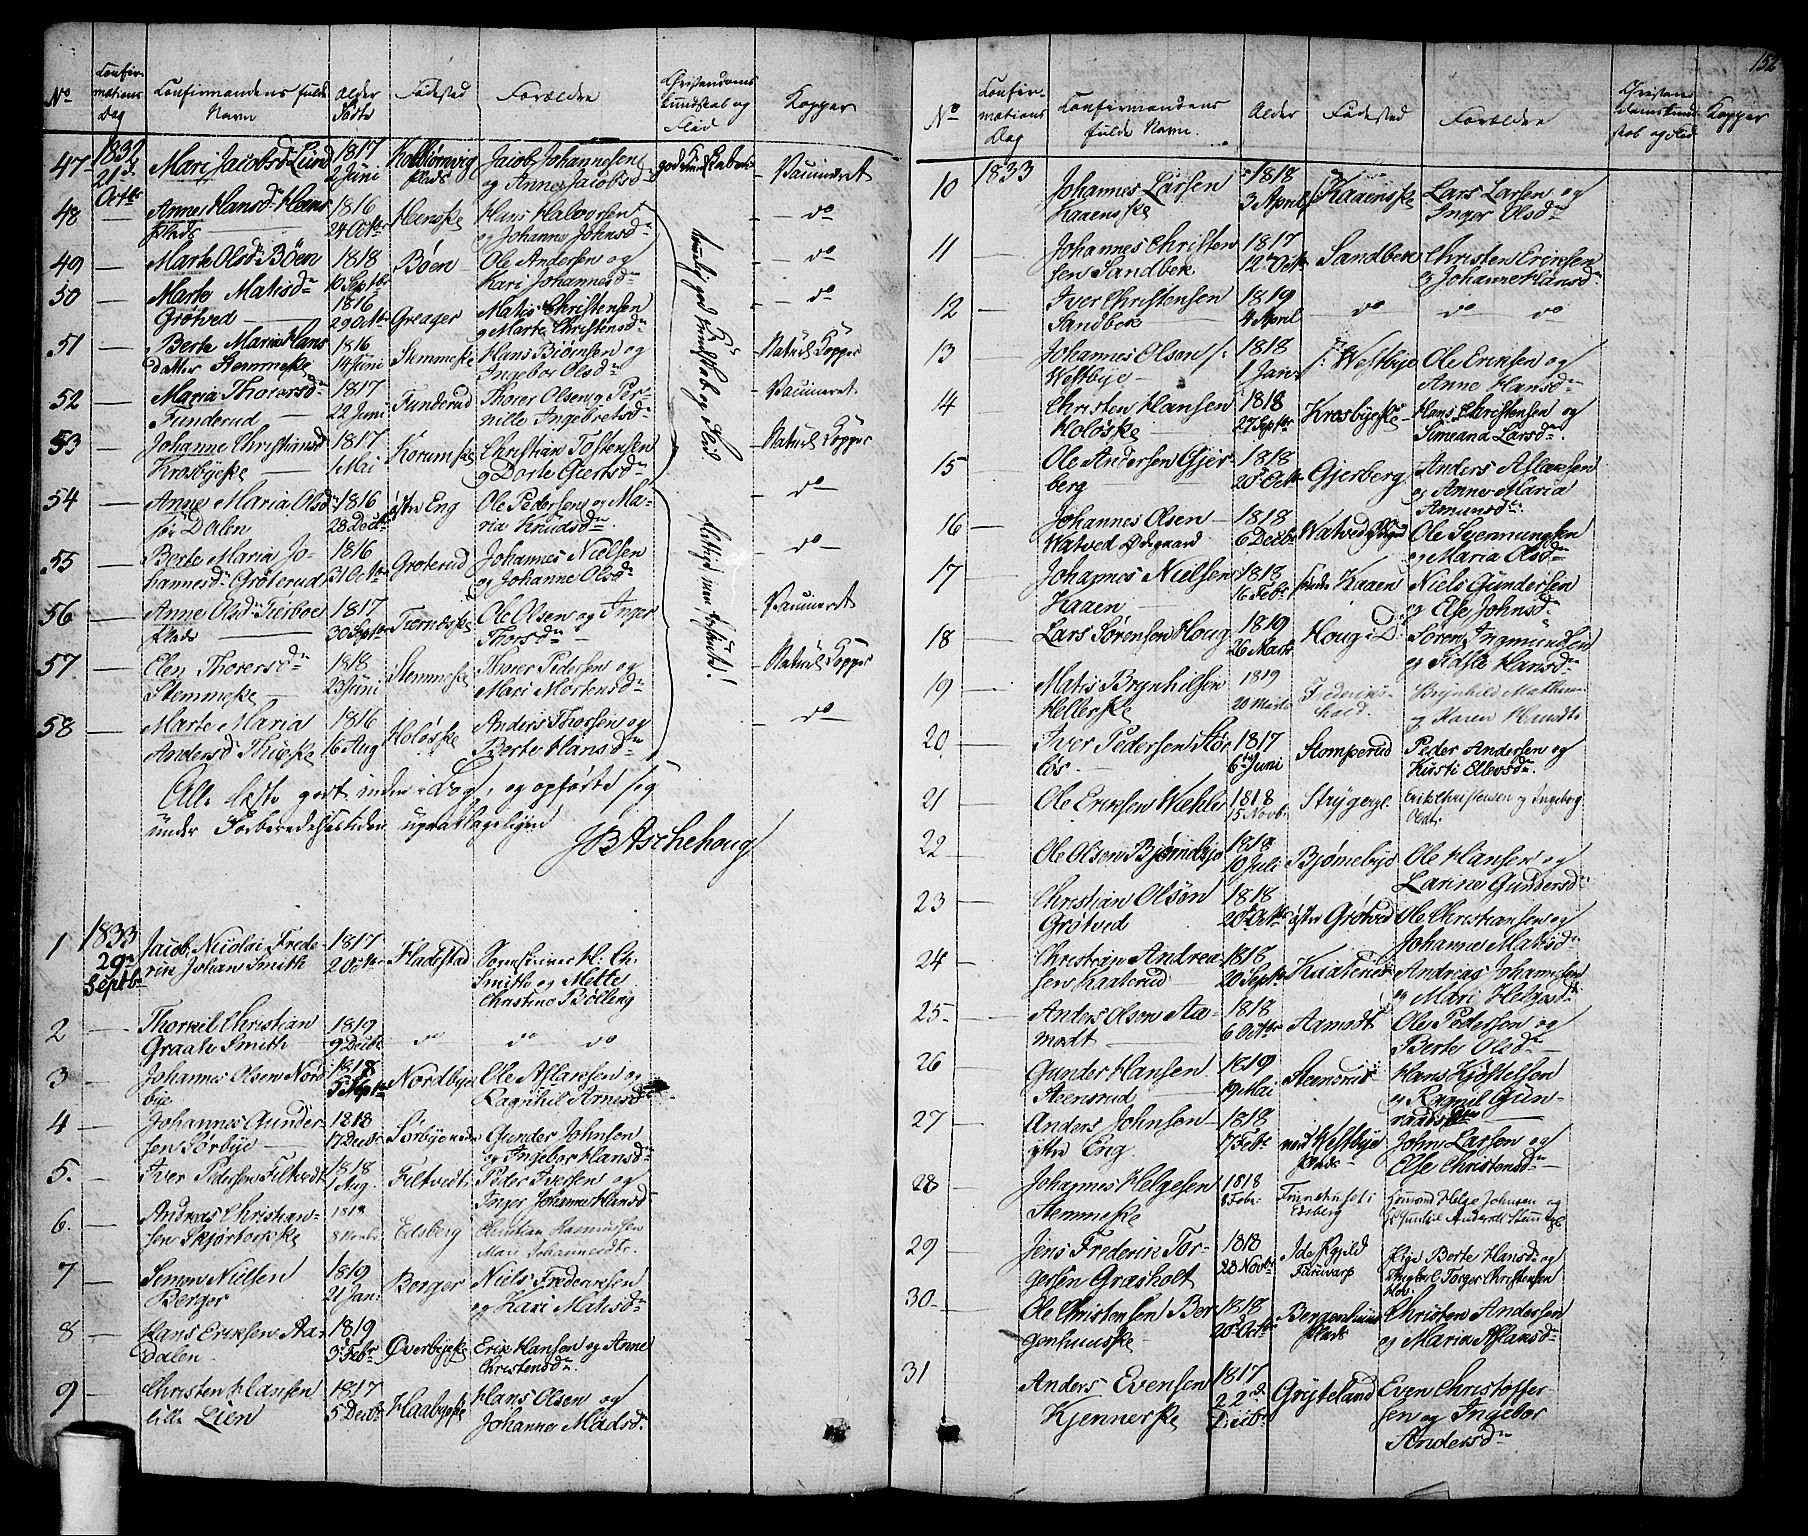 SAO, Rakkestad prestekontor Kirkebøker, F/Fa/L0007: Ministerialbok nr. I 7, 1825-1841, s. 152